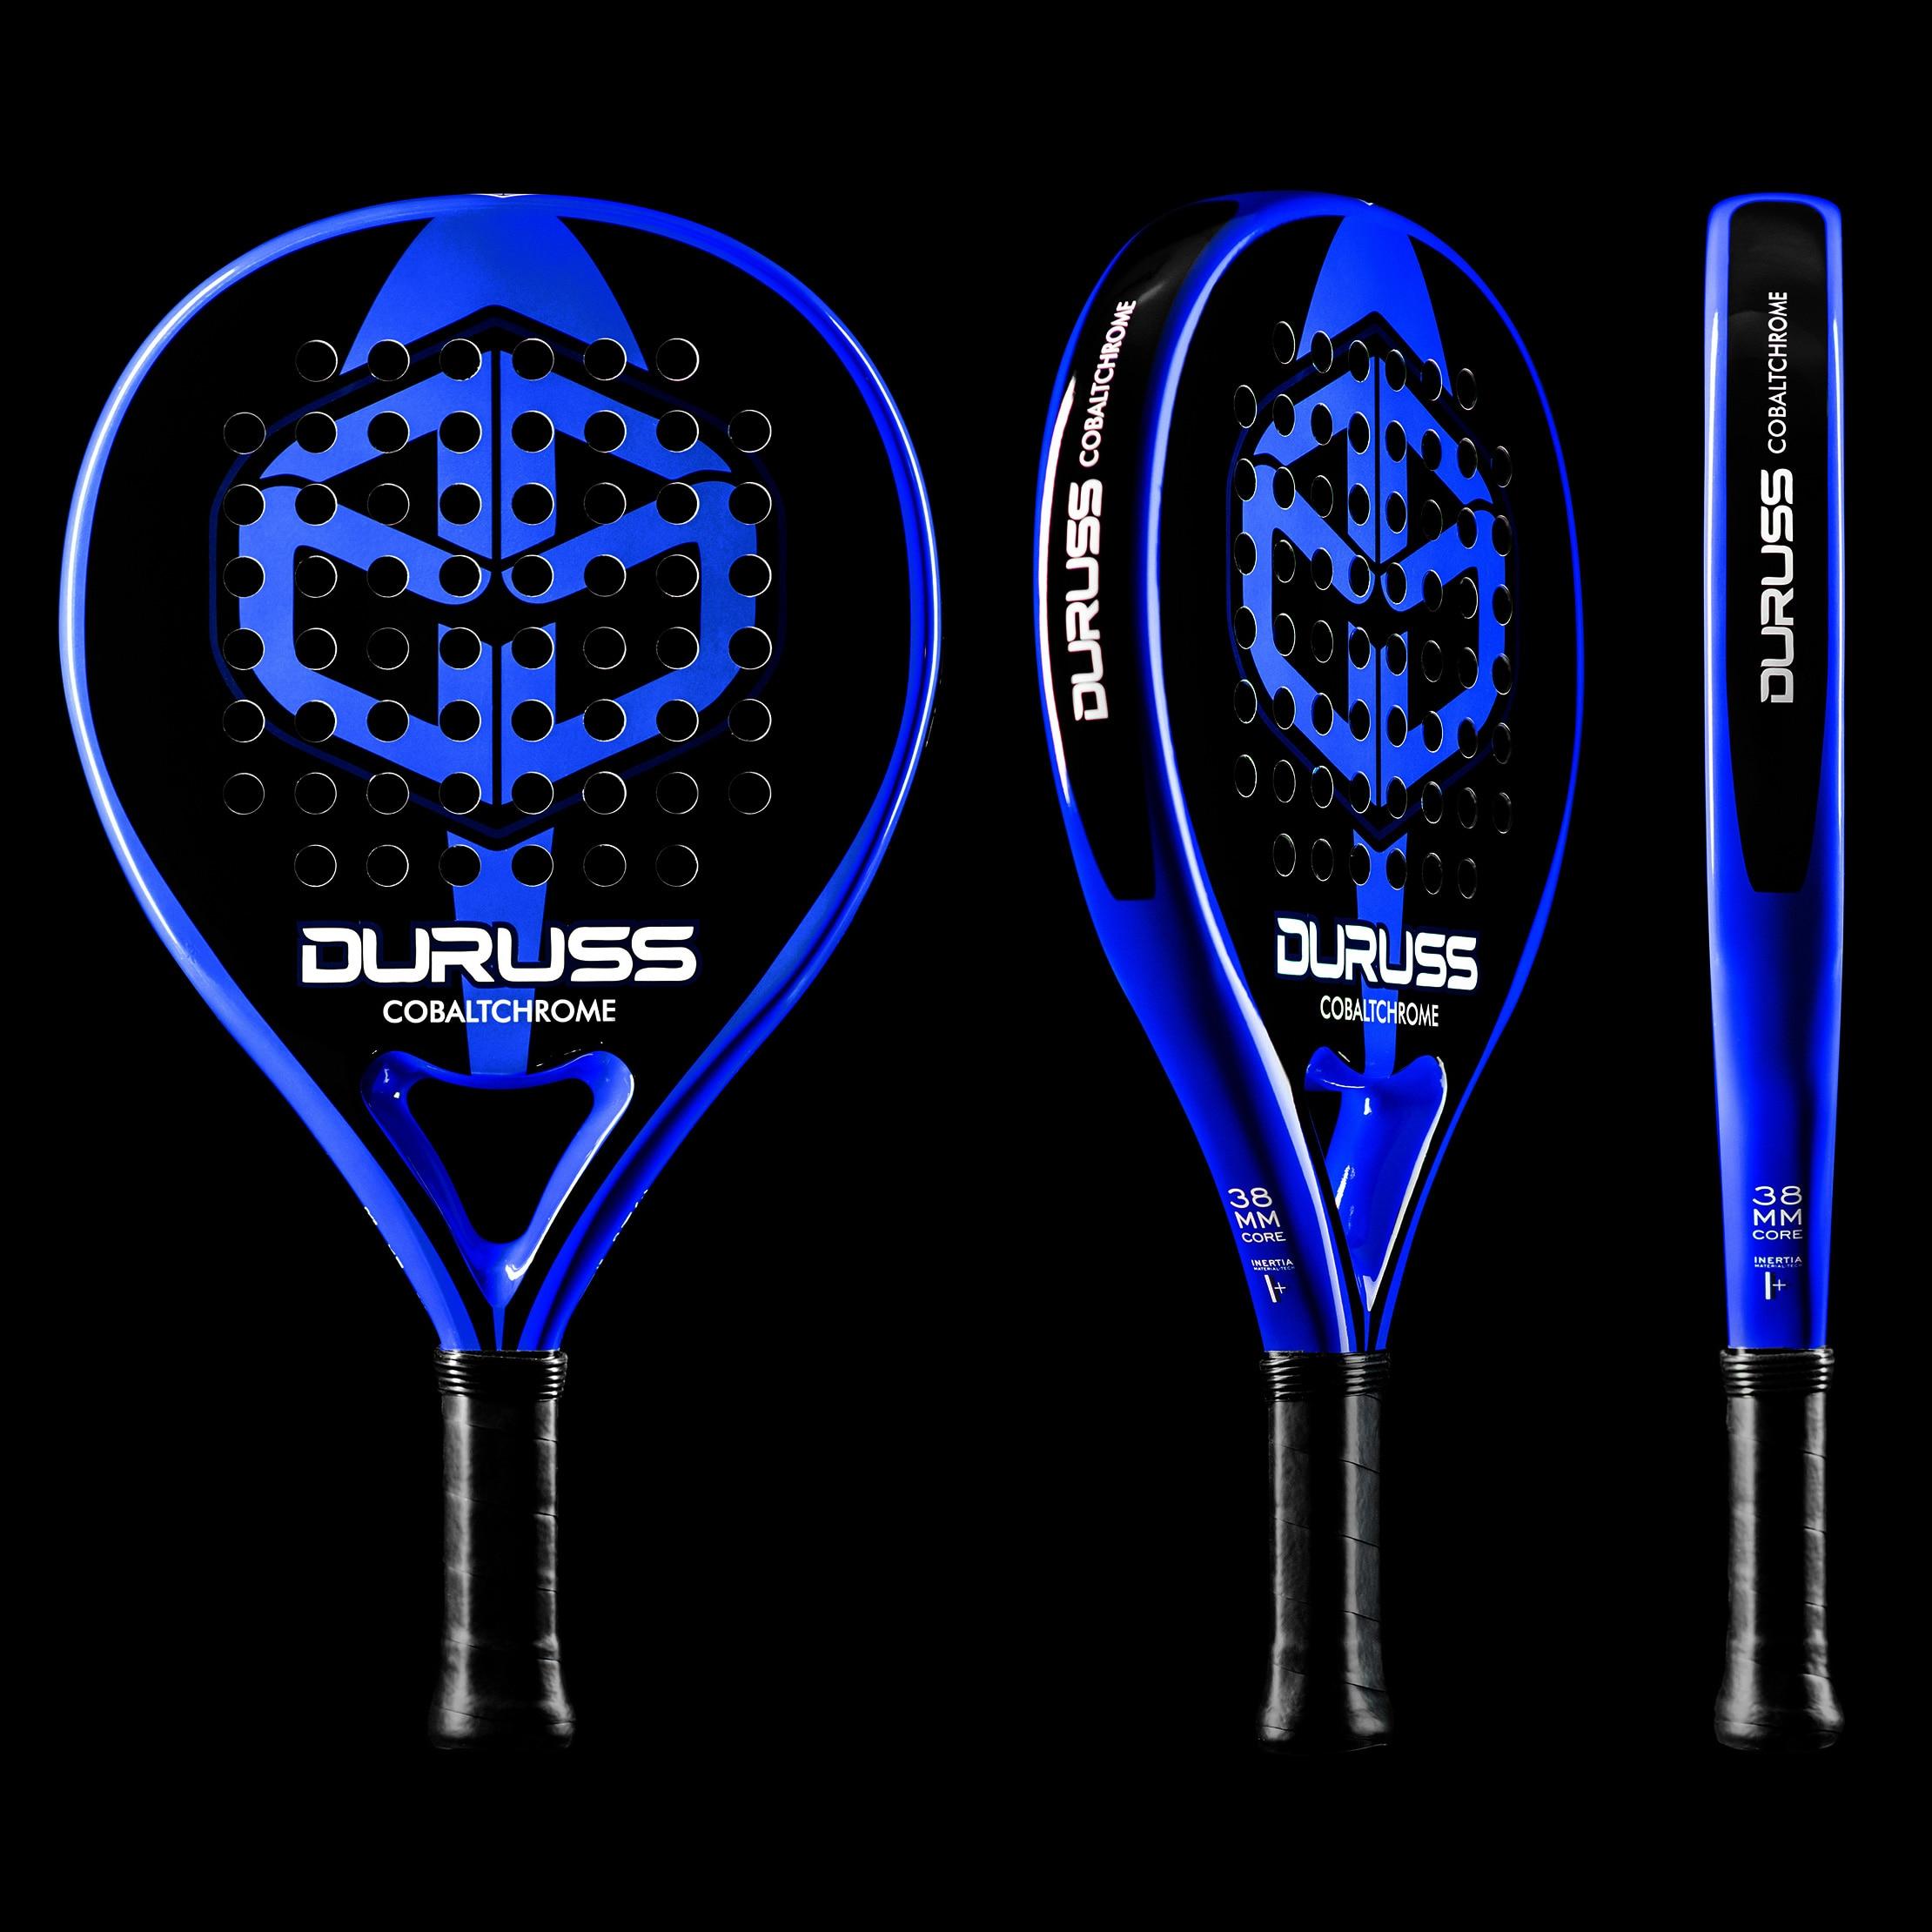 Tennis Paddle Raquet Professional Cobalt Chrome. High Technology. Premium Pro Carbon And Fiberglass. PU Sheath 350 - 365 G